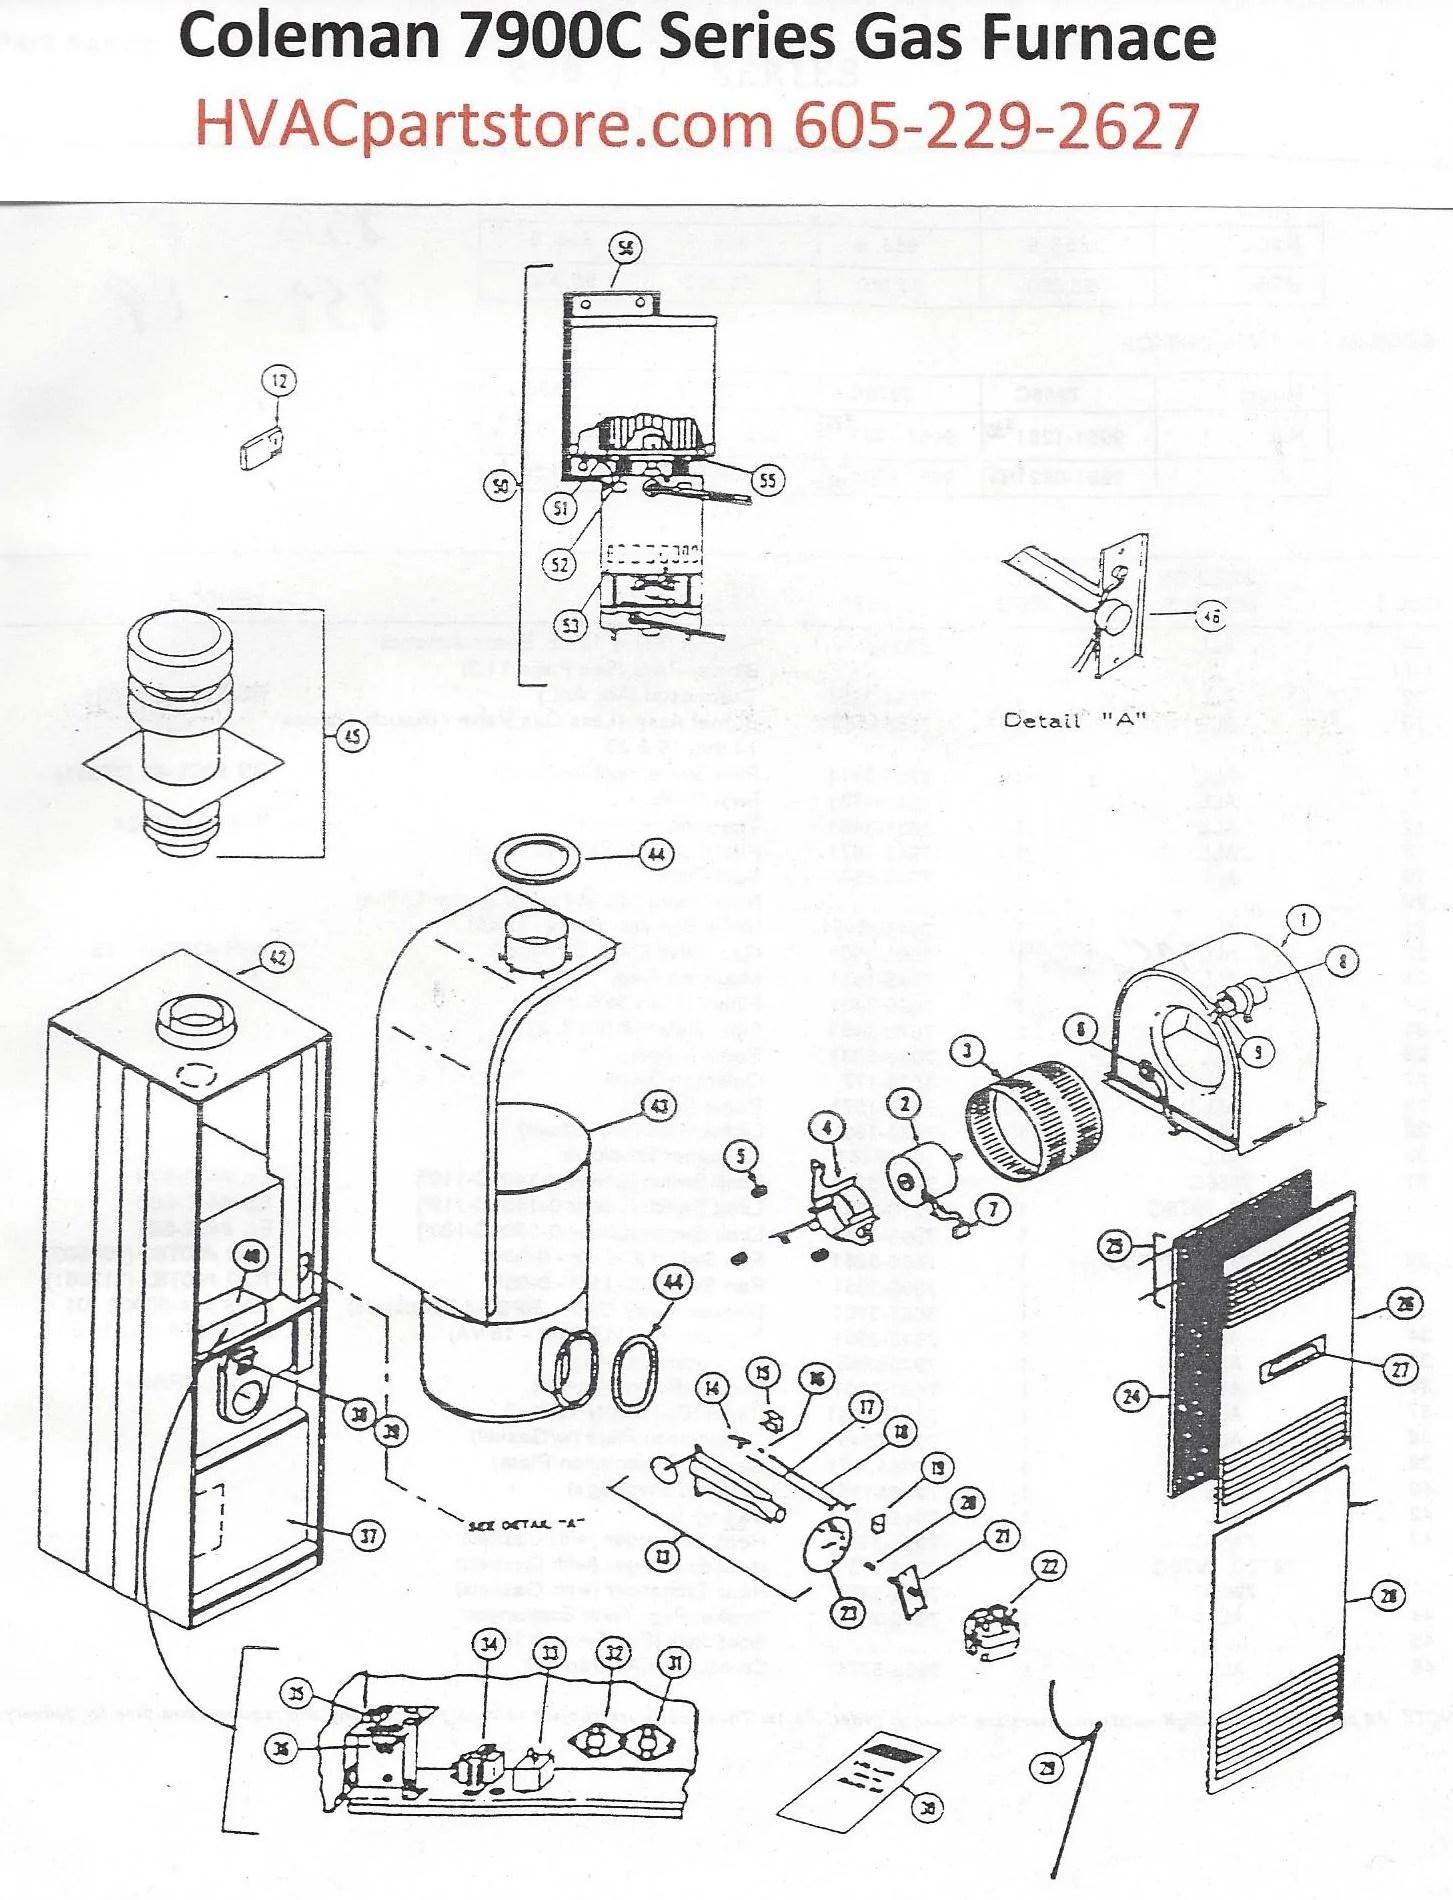 medium resolution of coleman furnace schematics wiring diagram schematics coleman furnace 7970 656 schematic 7970c856 coleman gas furnace